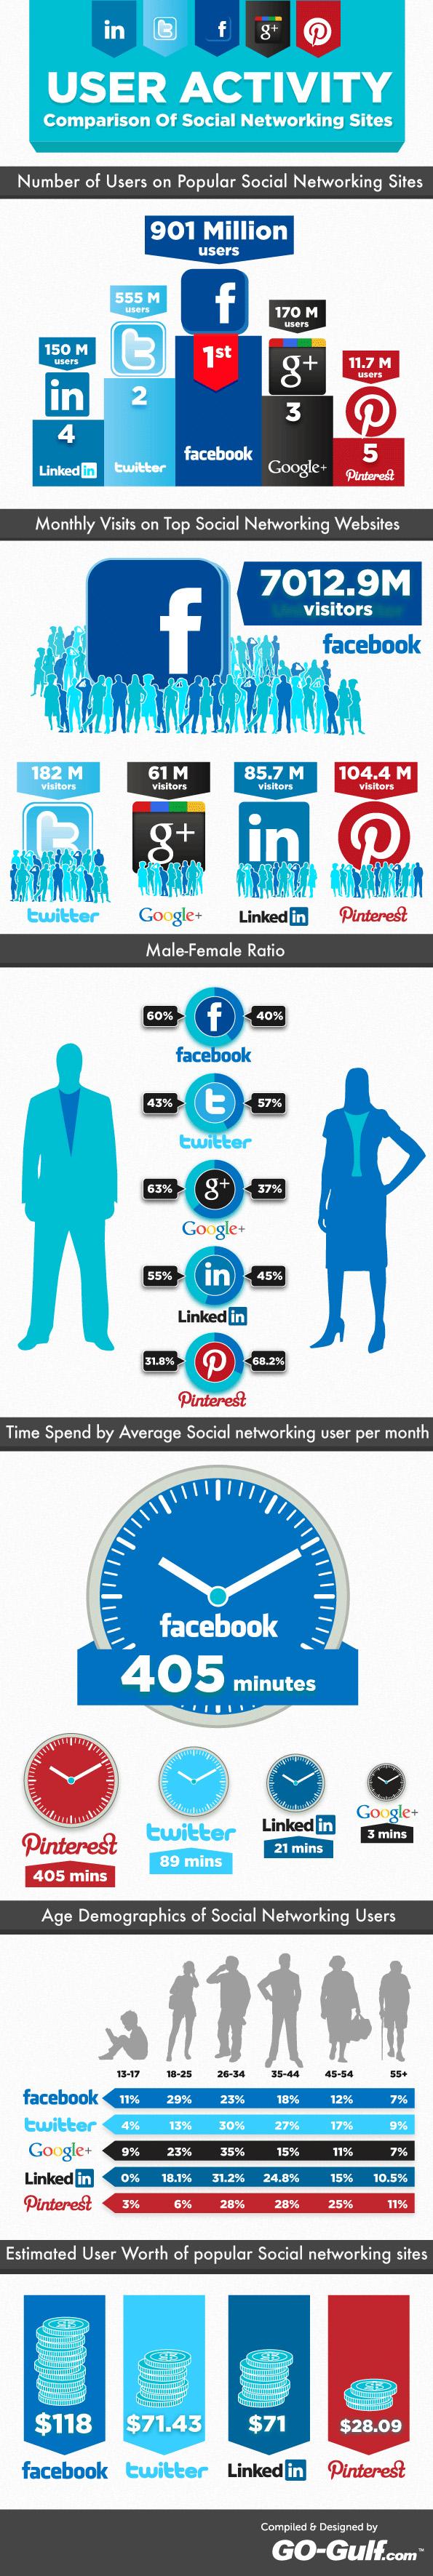 social networking users SeoCustomer